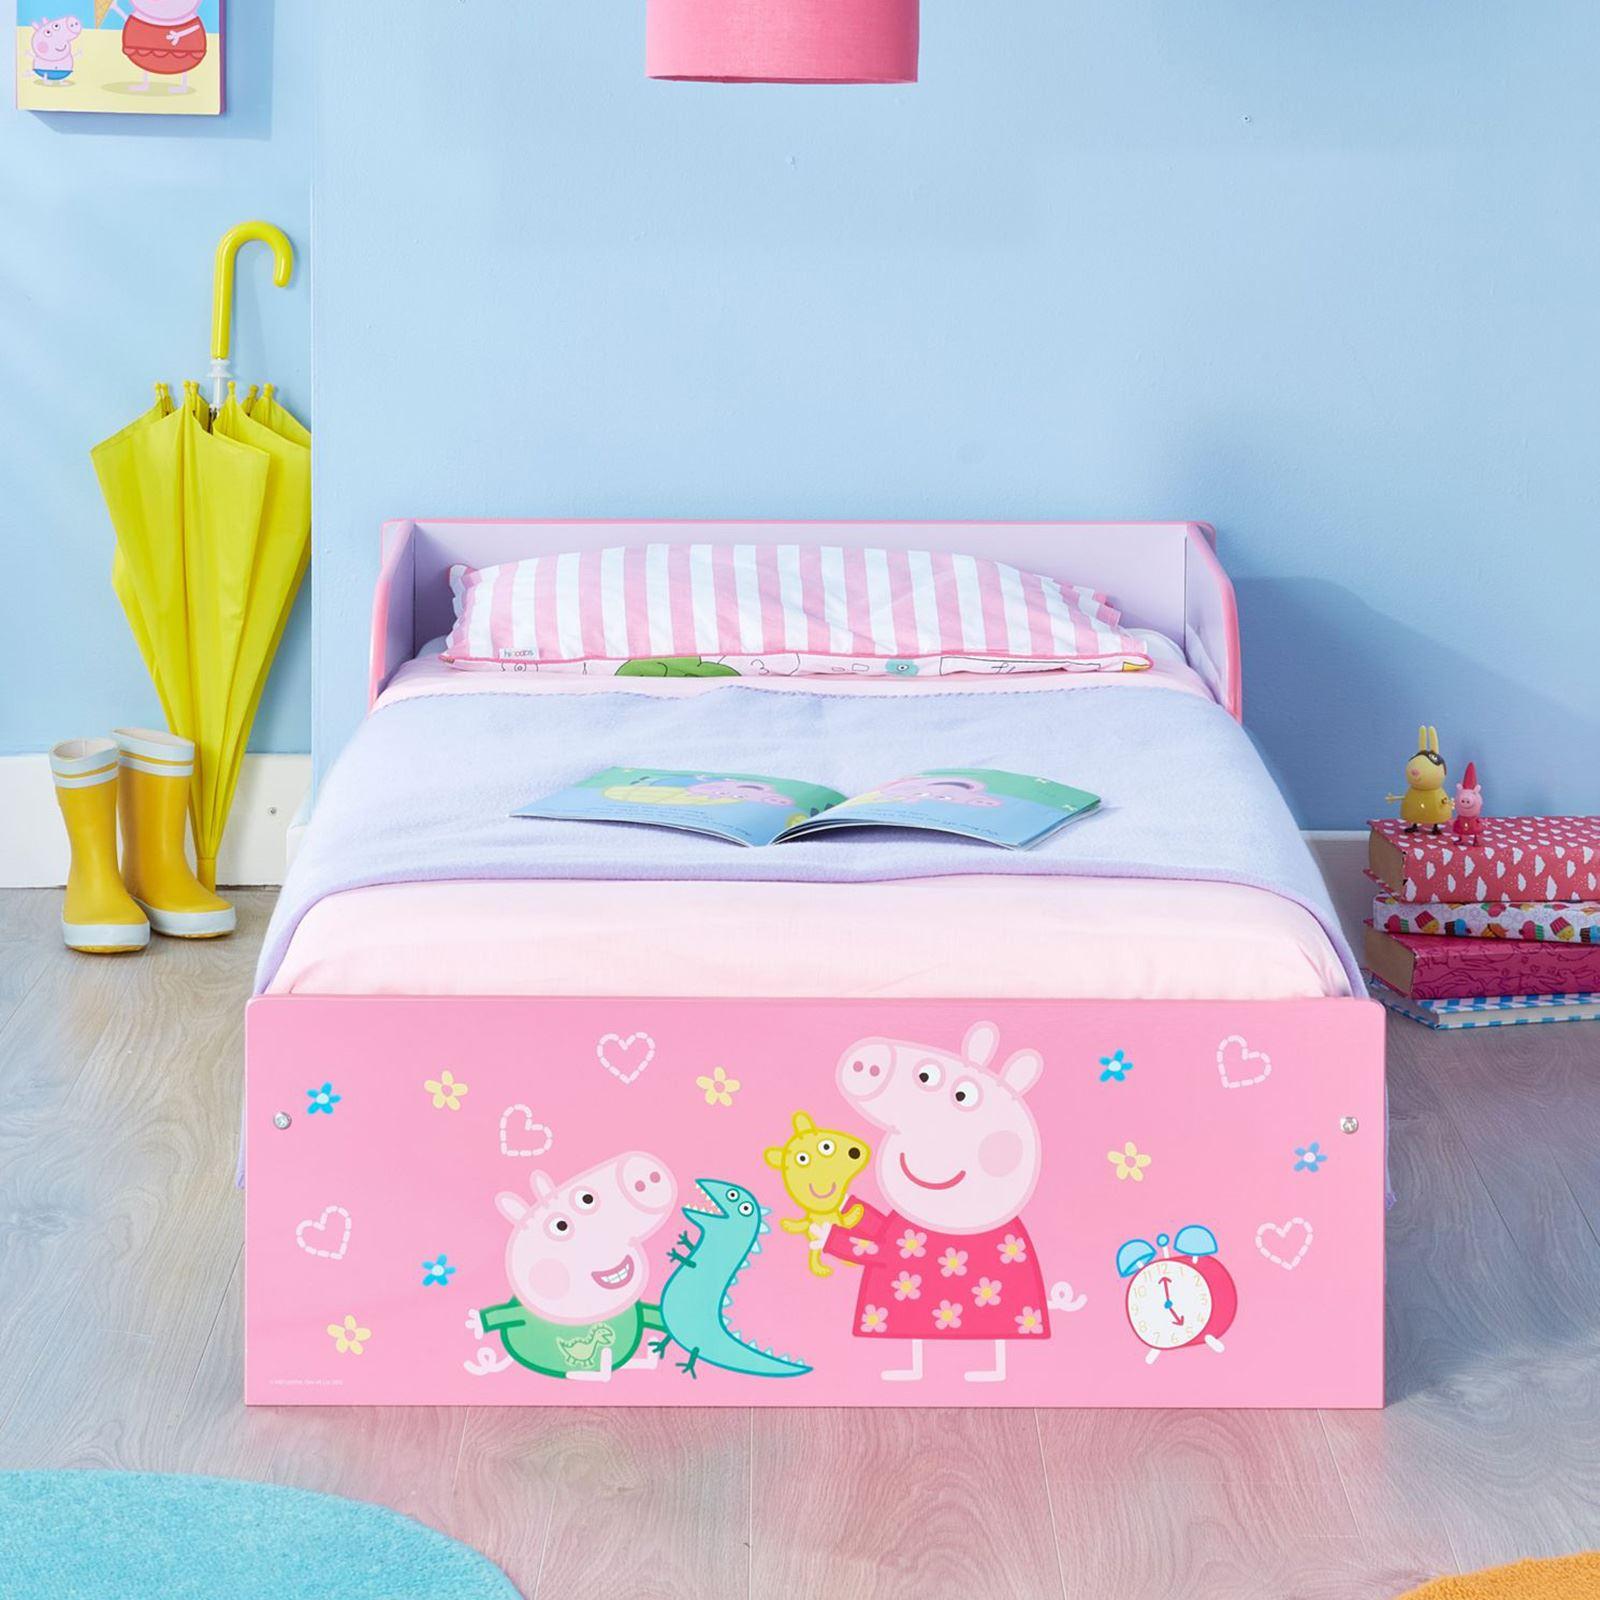 miniatura 59 - KIDS CHARACTER TODDLER BEDS - BOYS GIRLS BEDROOM DISNEY